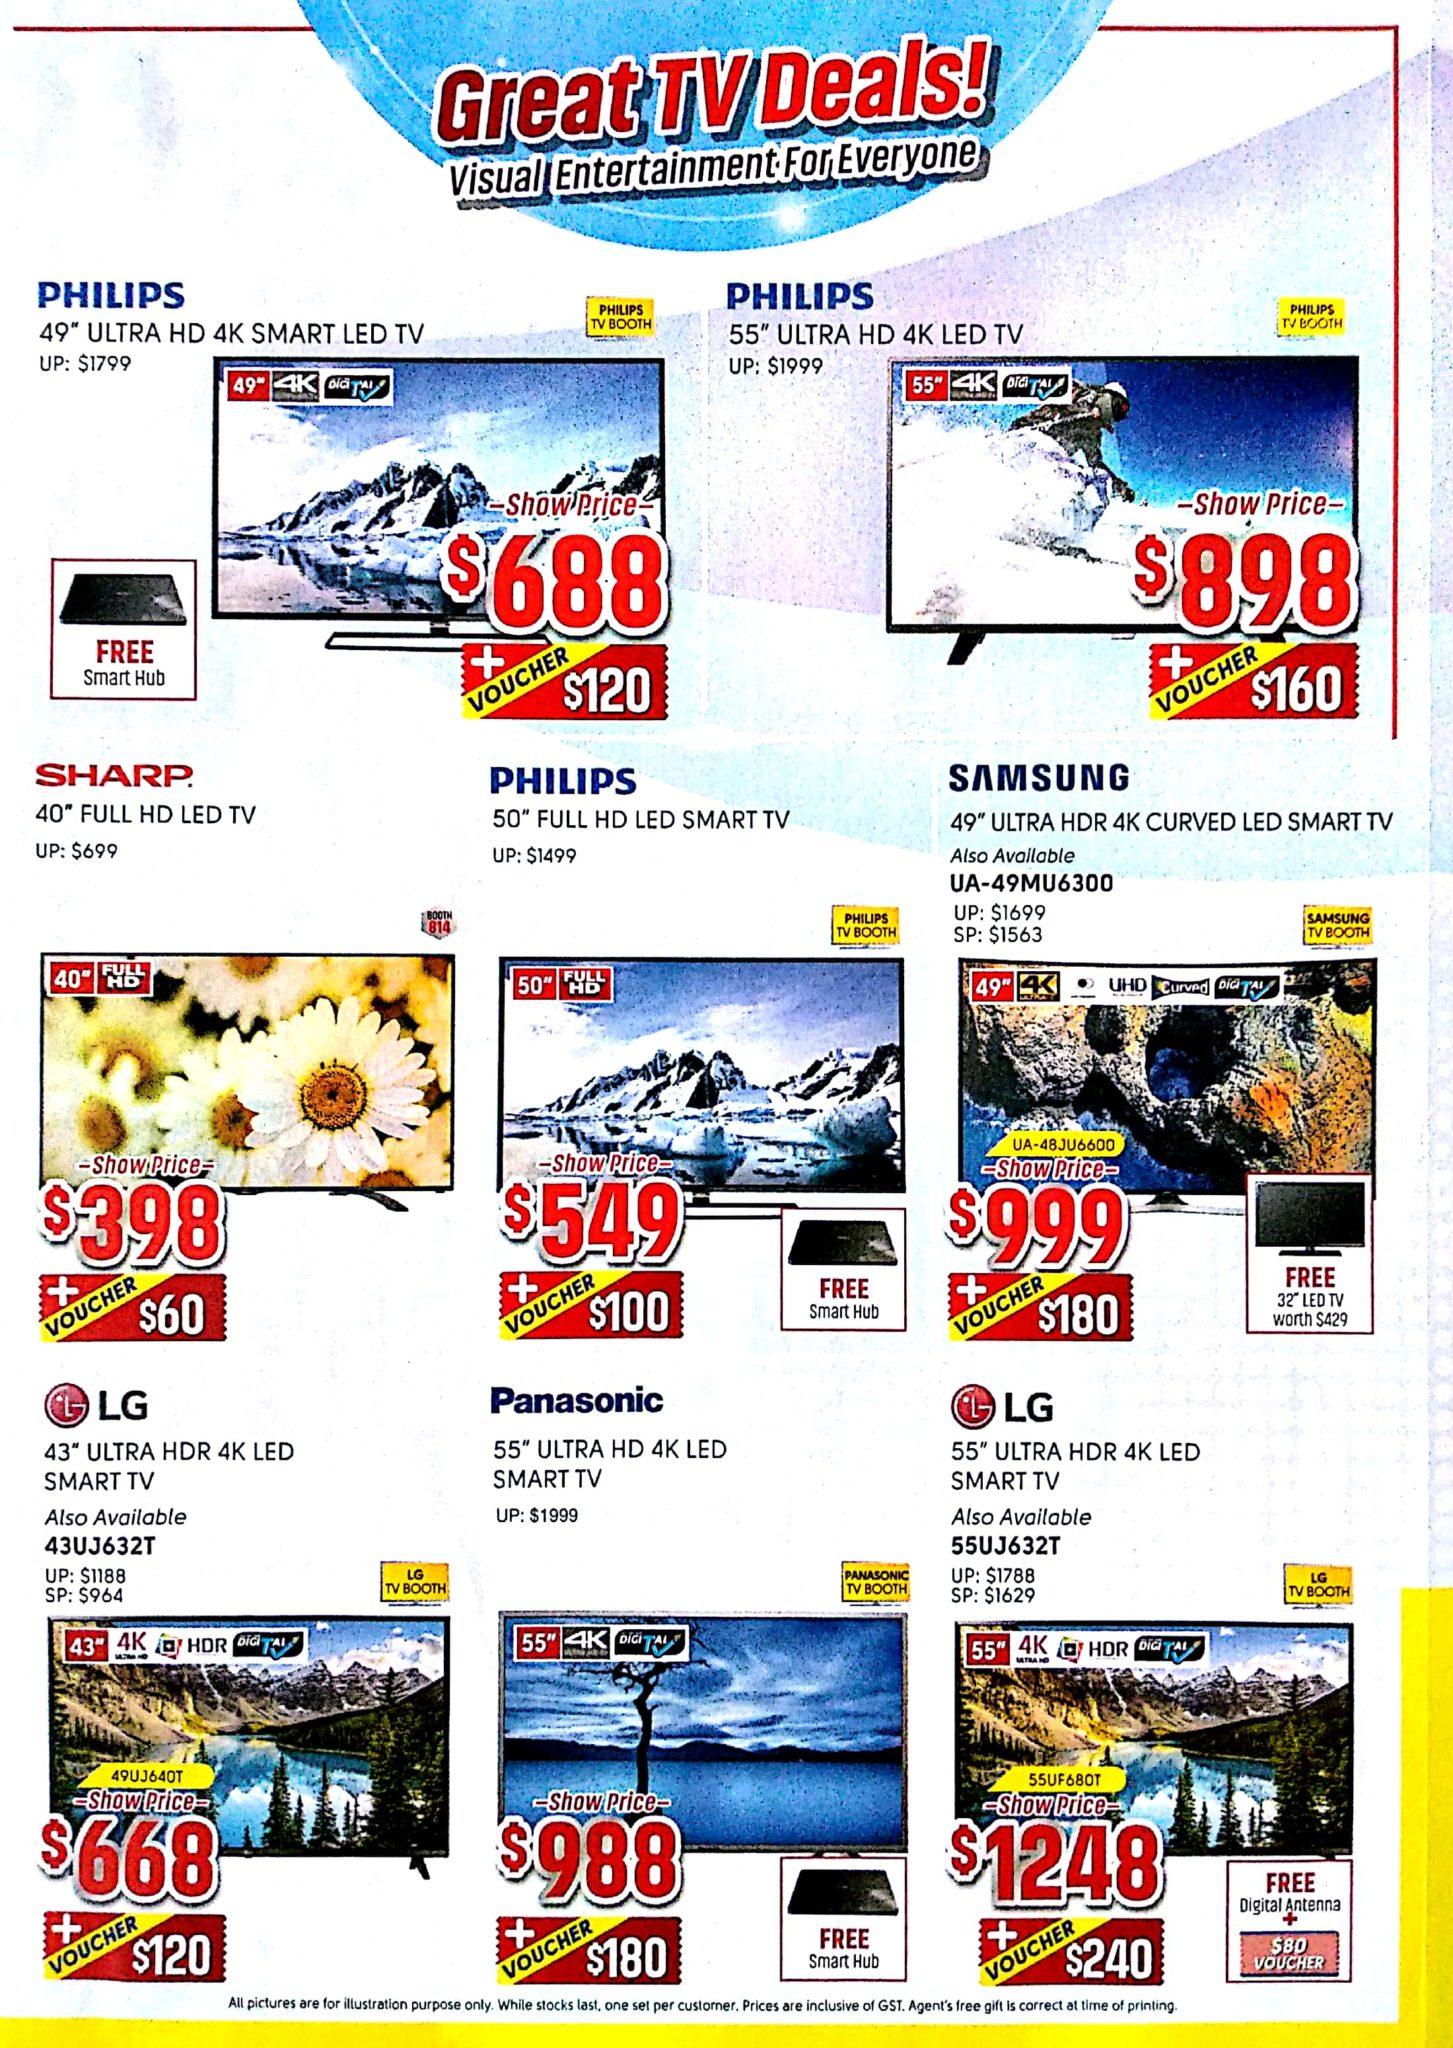 Great Electronics EXPO 2017 | 8 - 10 Dec 2017 | 11am - 9pm | Singapore EXPO | Brochure pg4